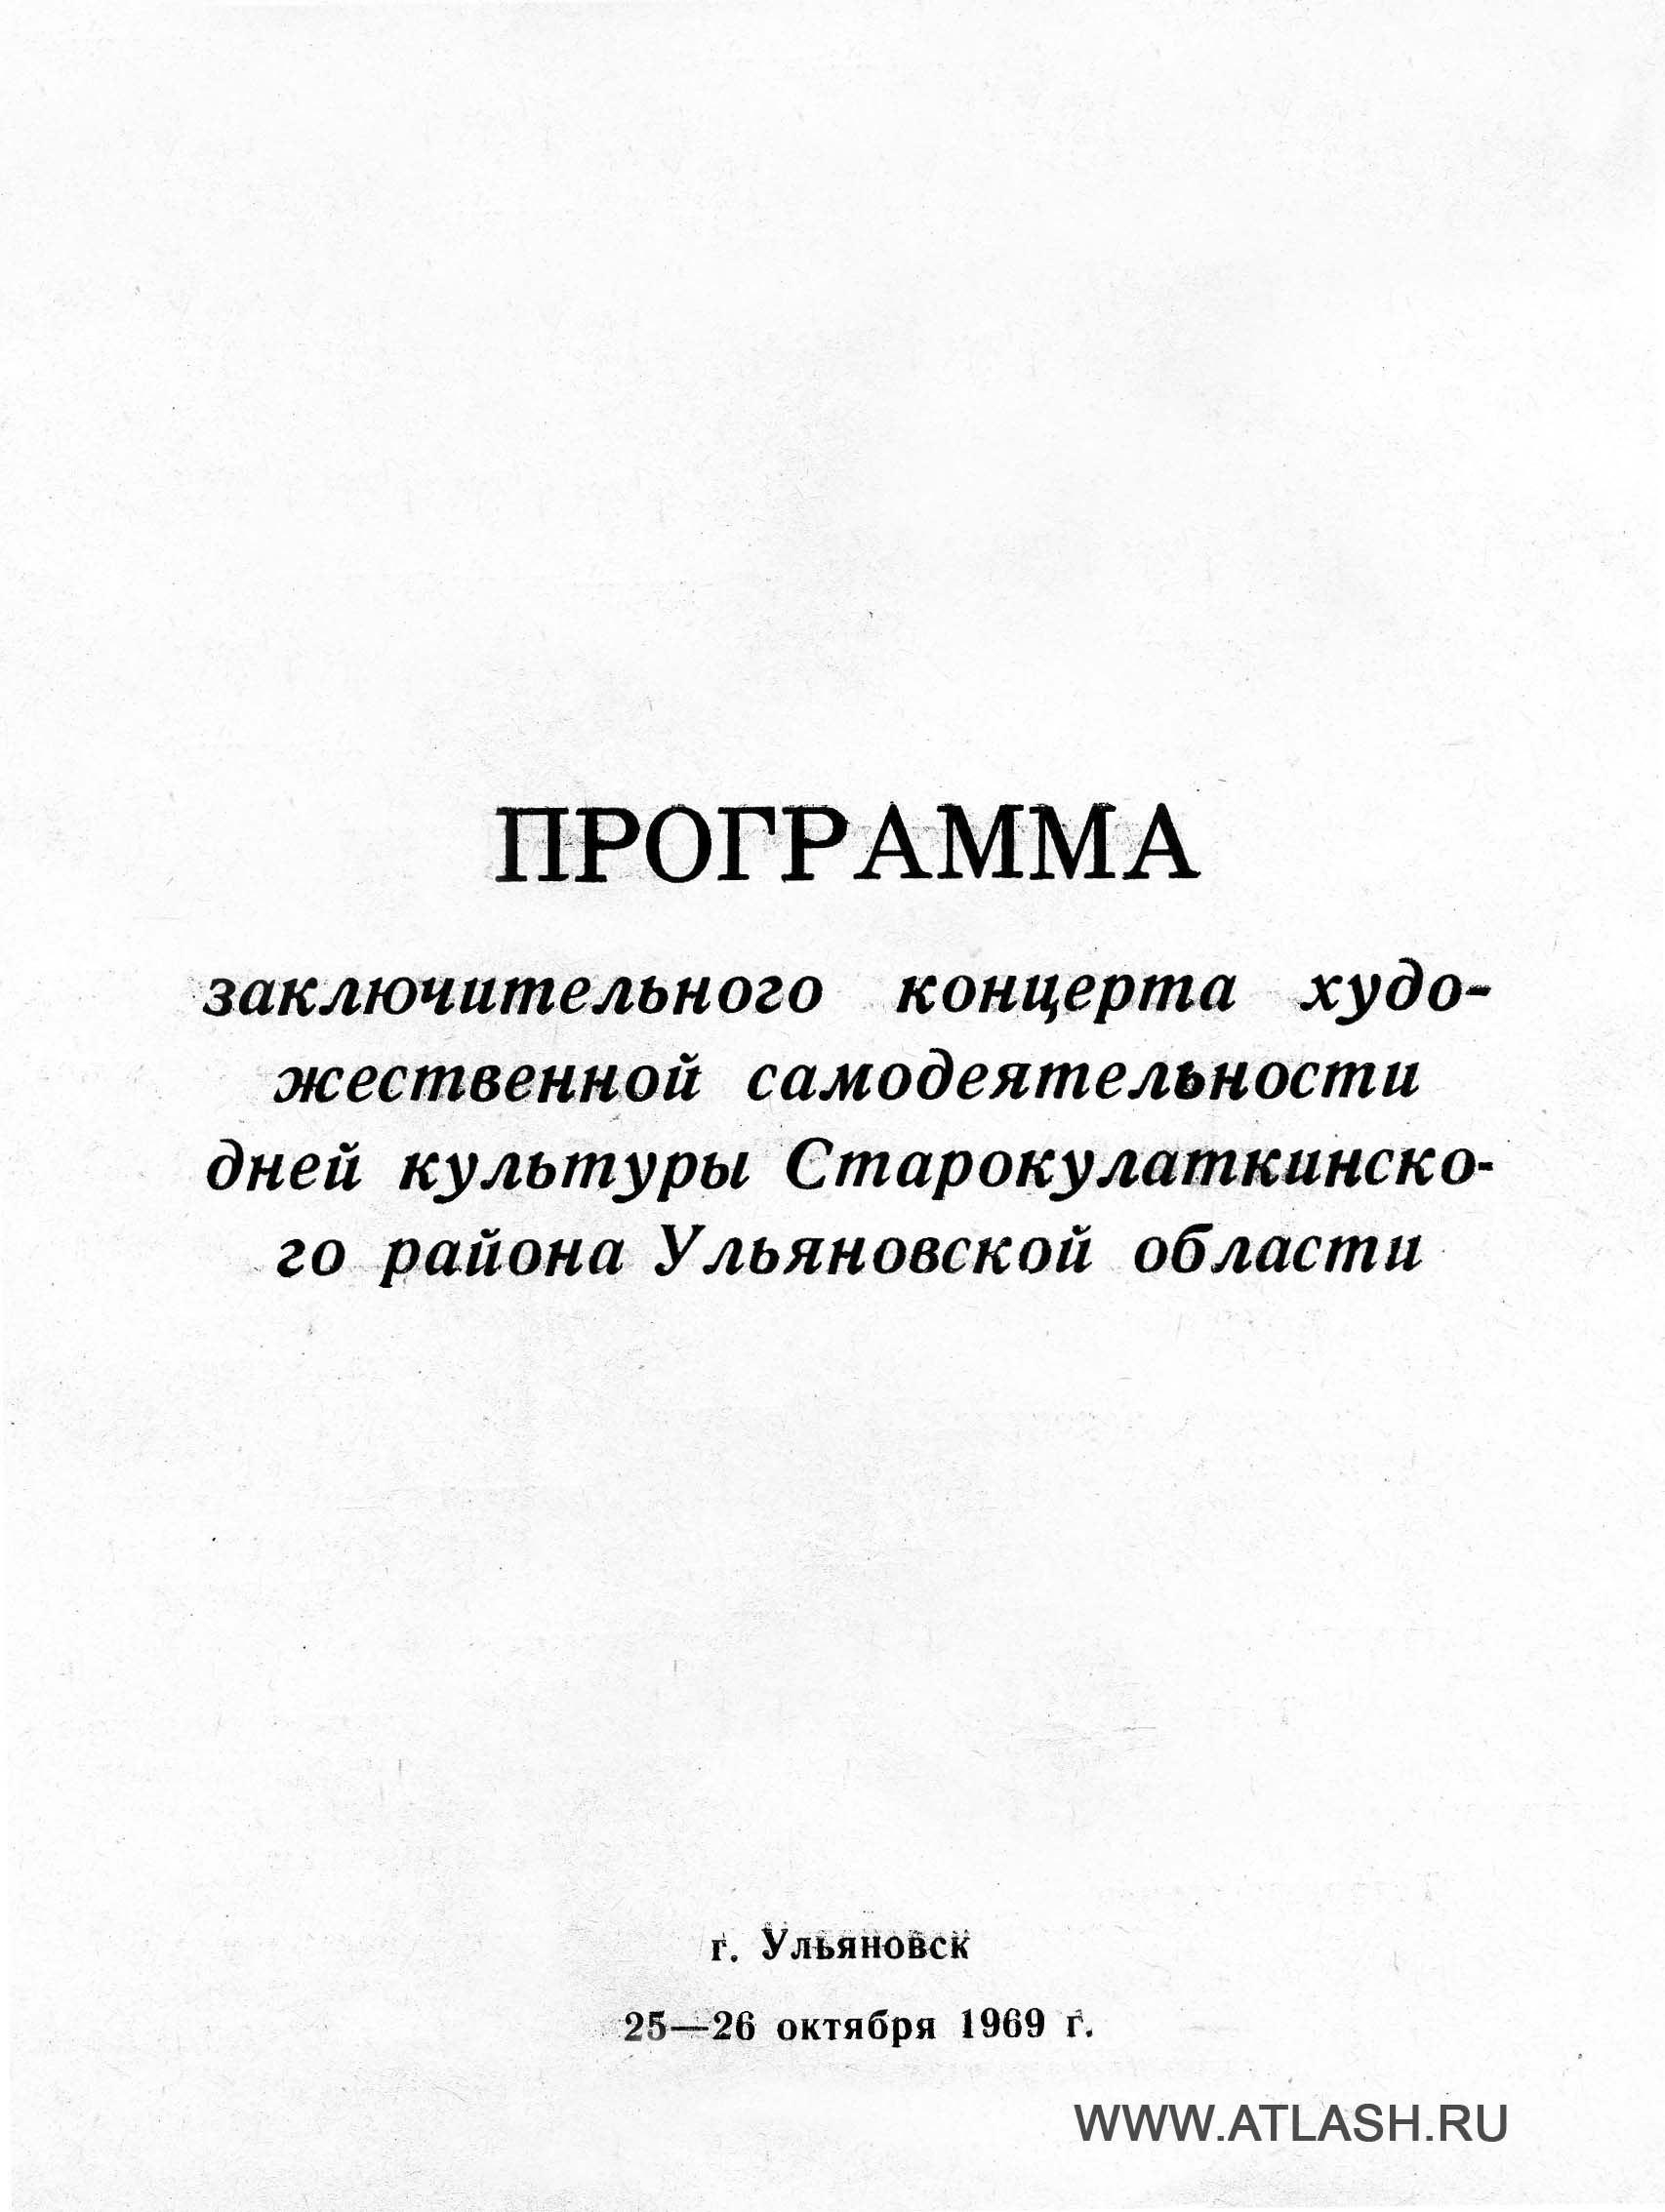 nahod_06_01